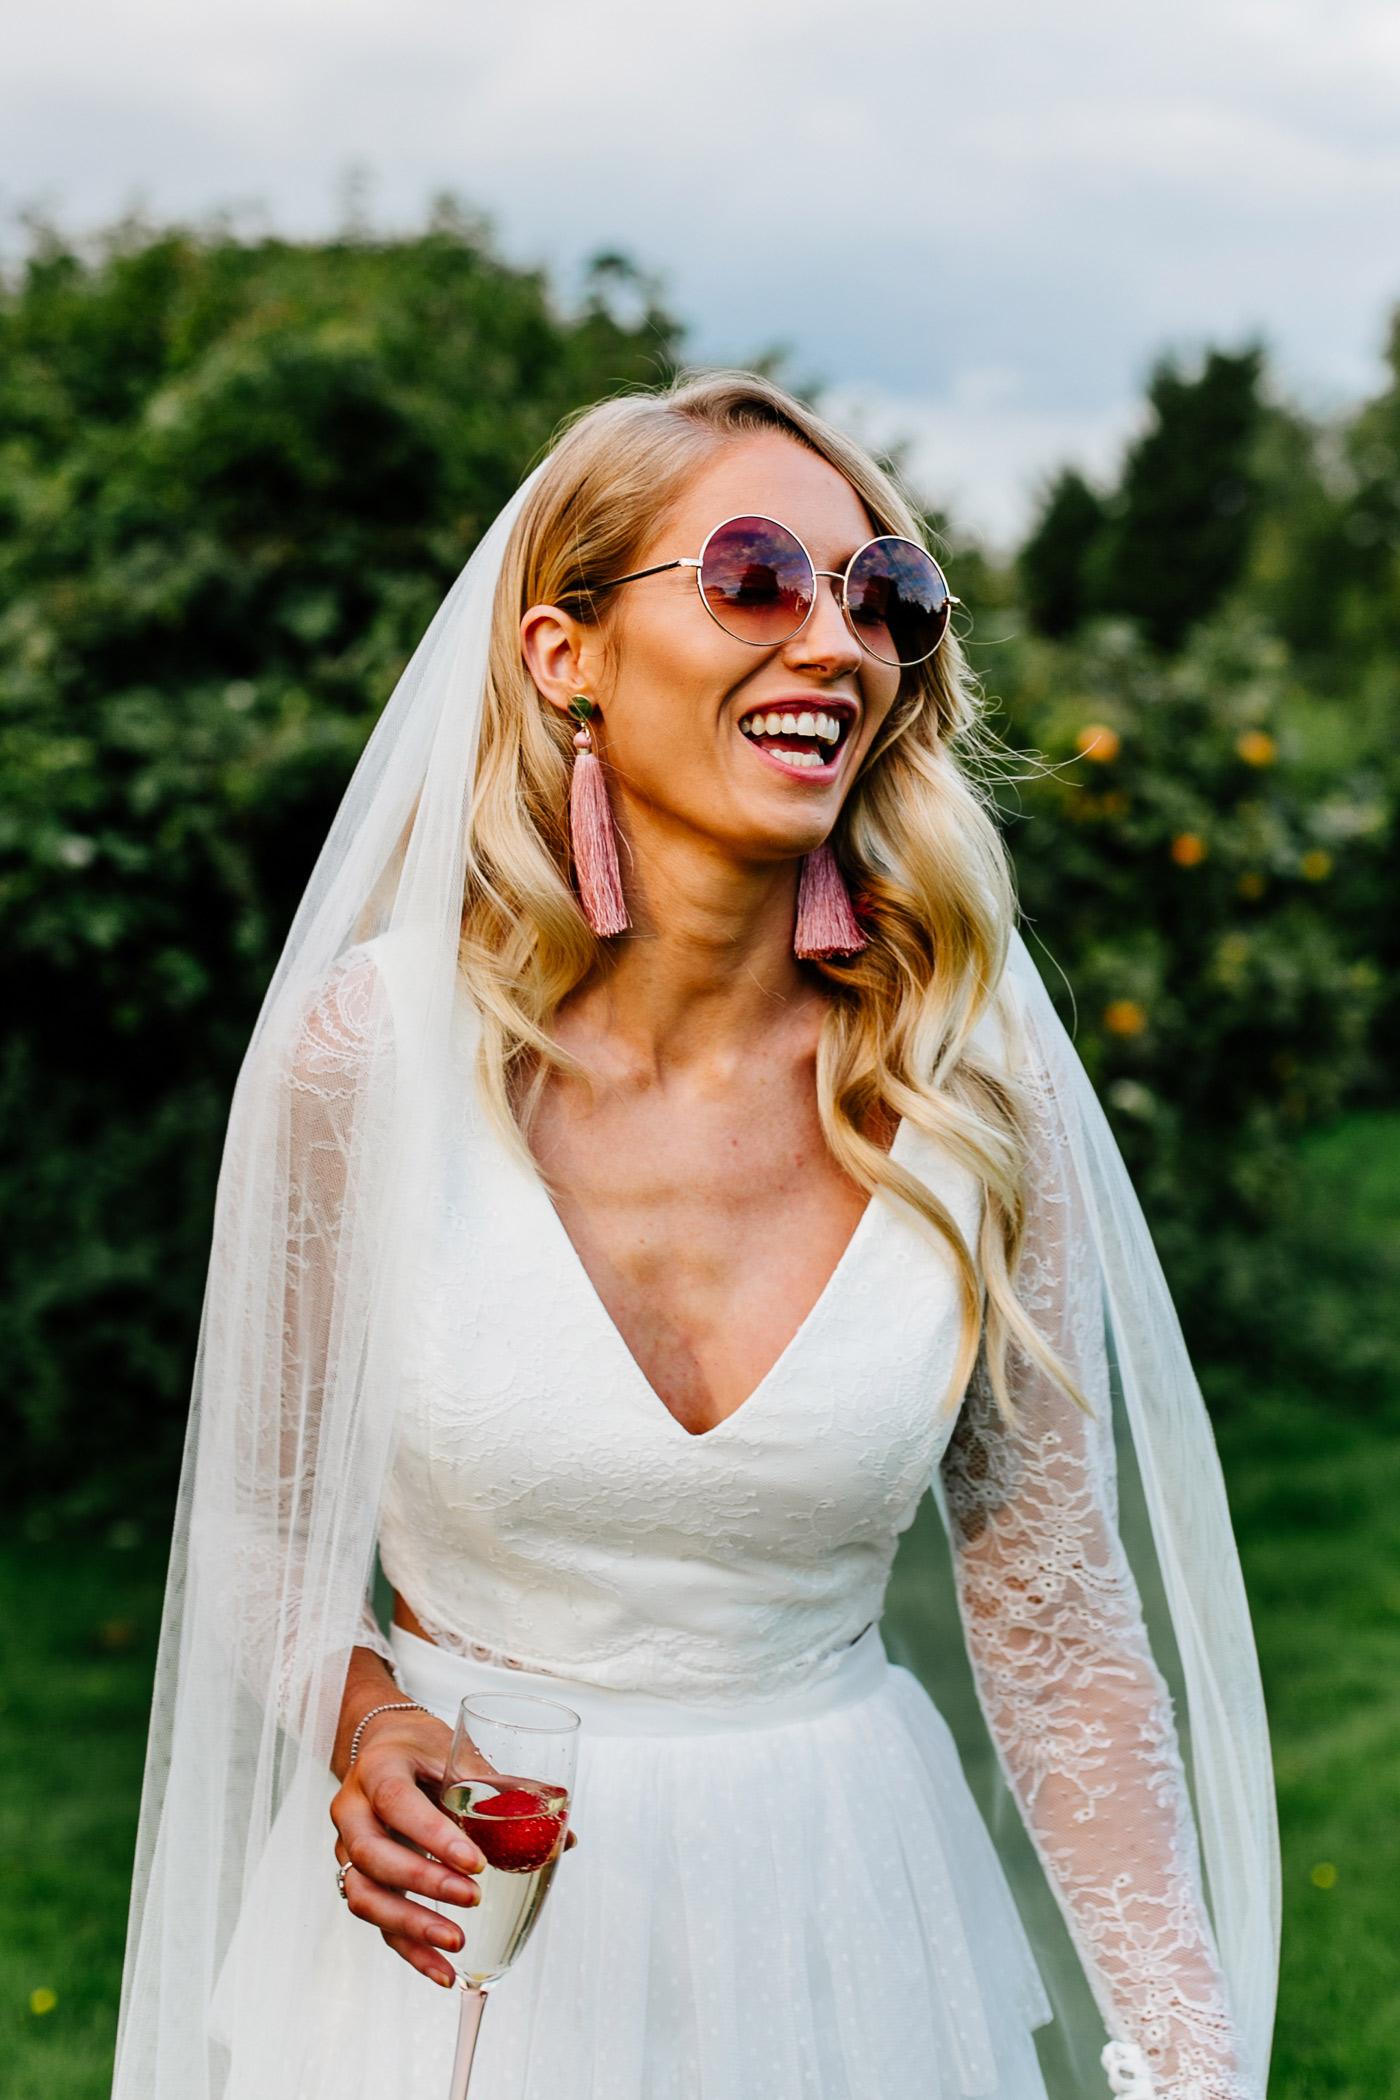 KENT-ELOPEMENT-wedding-photographer-UK-London-Epic-Love-Story-007